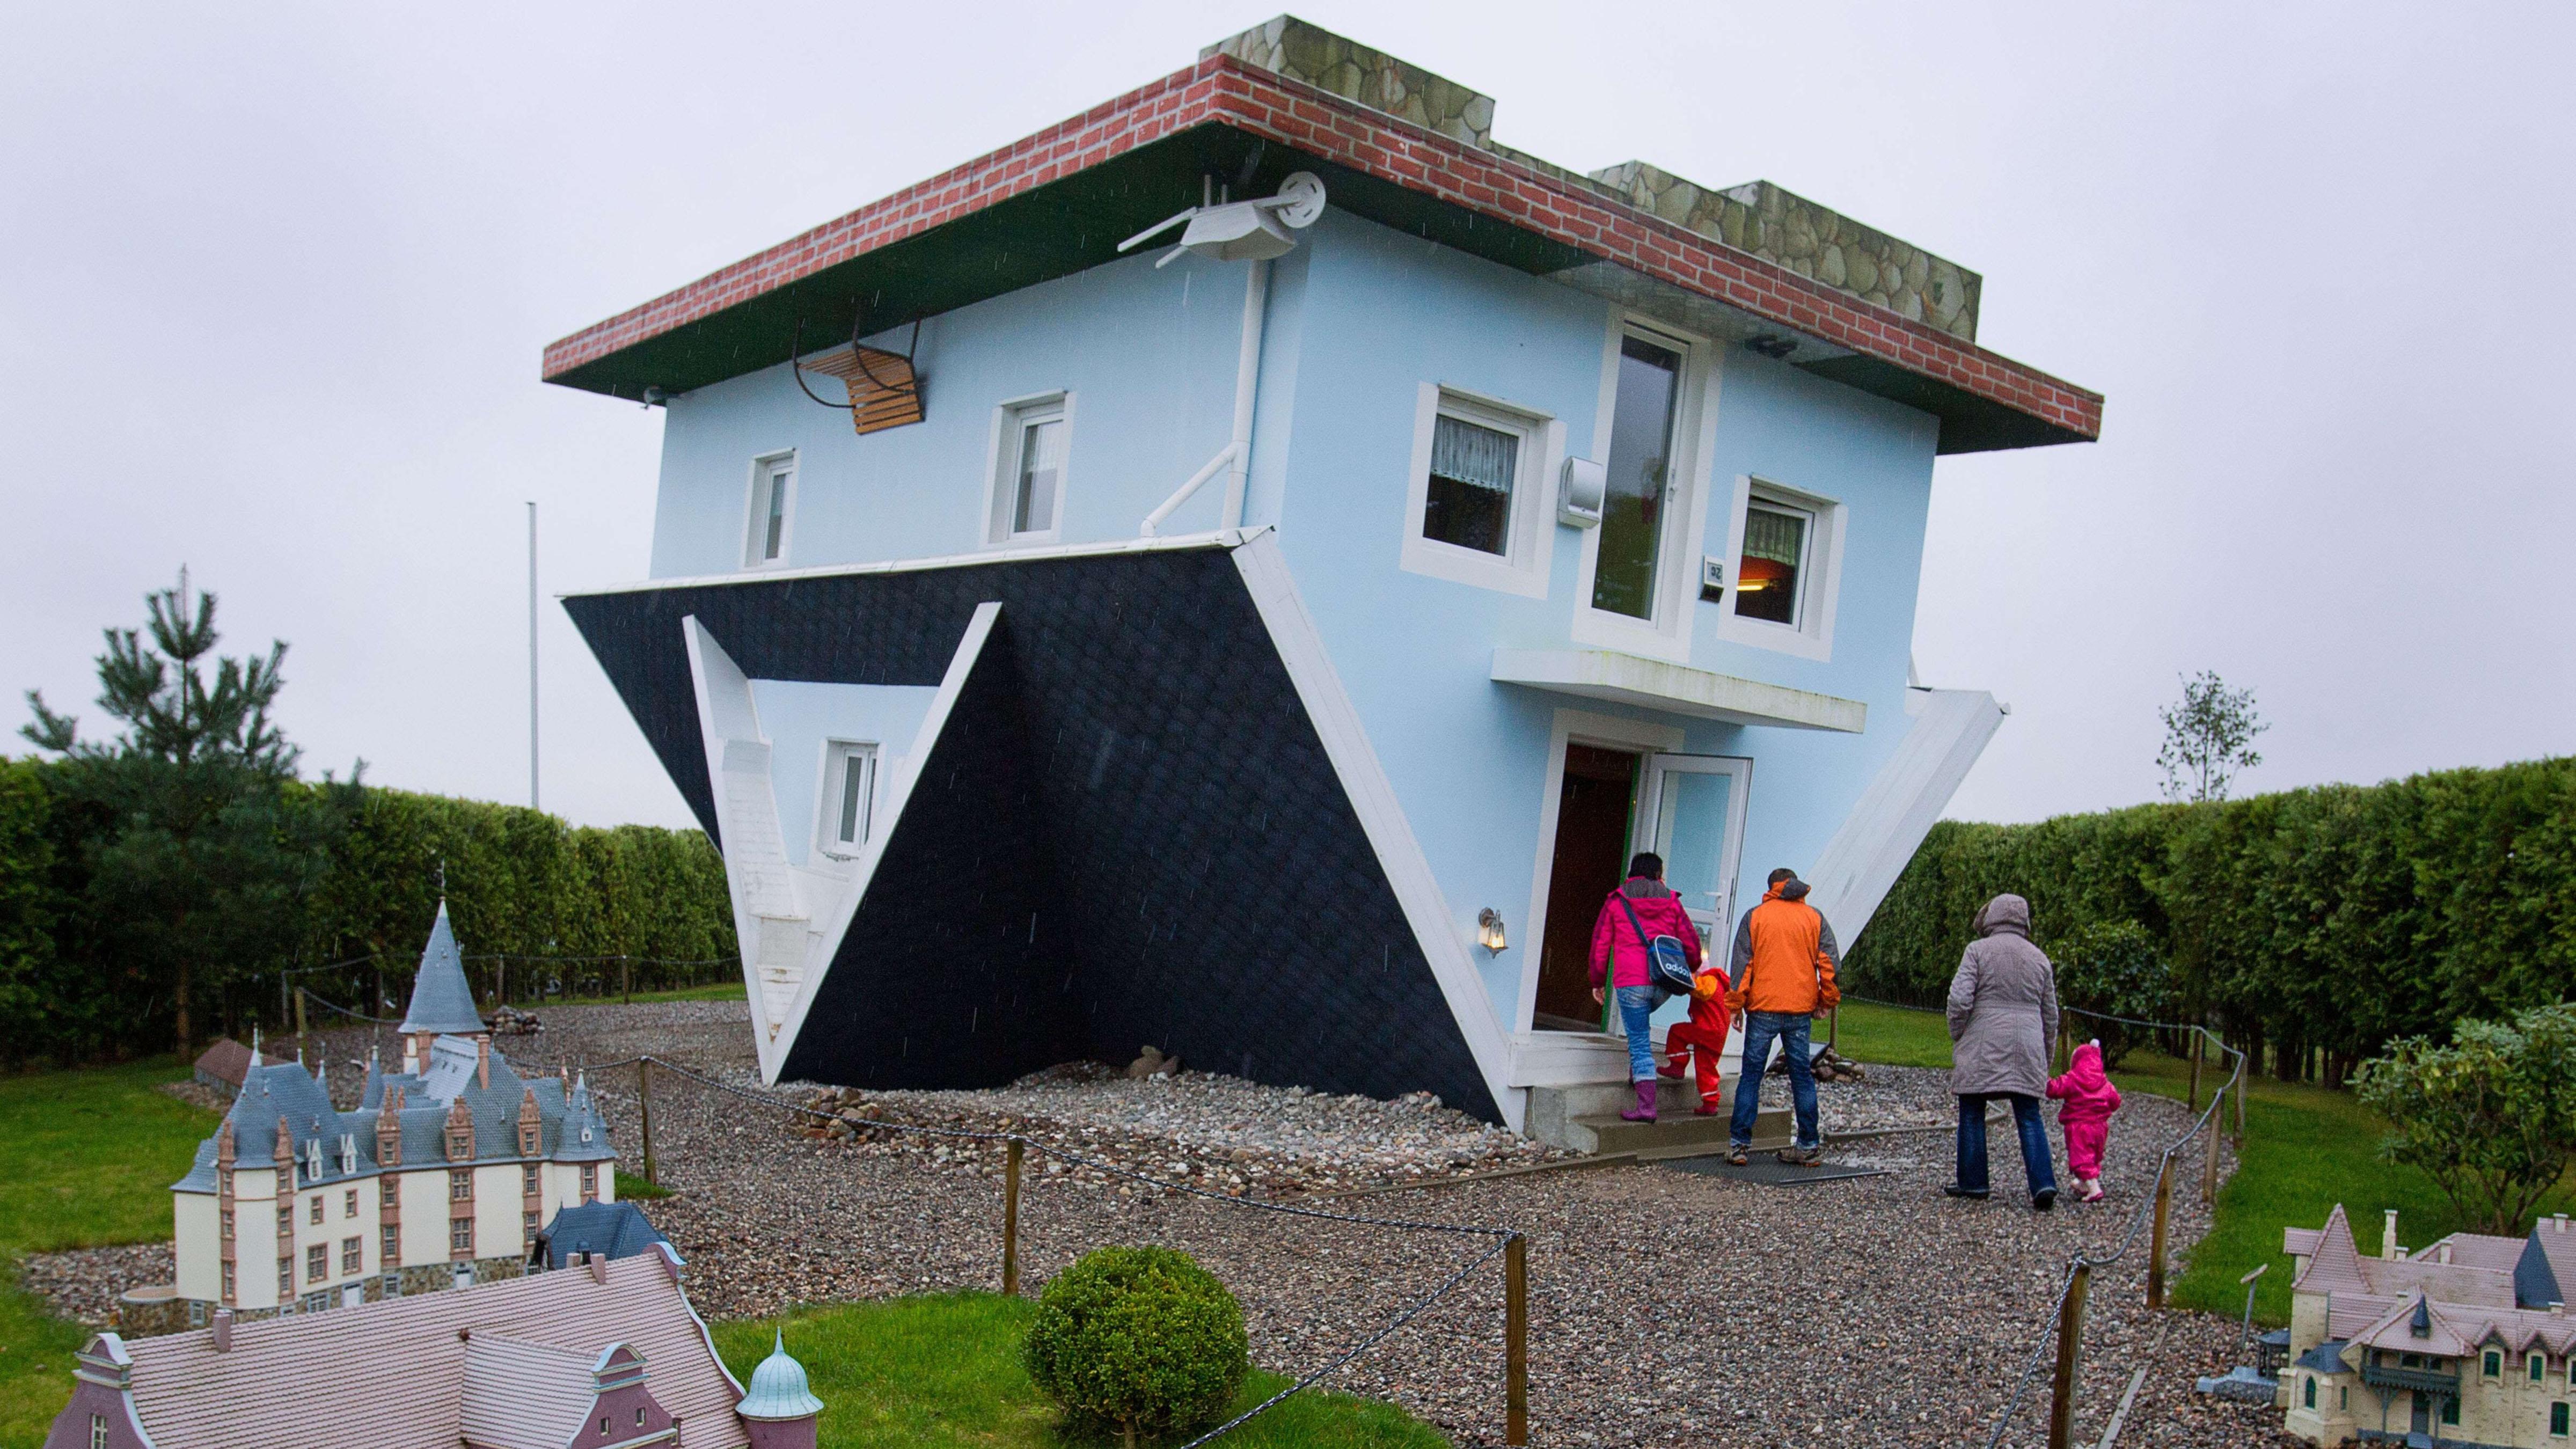 Nov. 5 Photo Brief: An upside-down house, volcano in Sumatra, torchbearers in Sochi